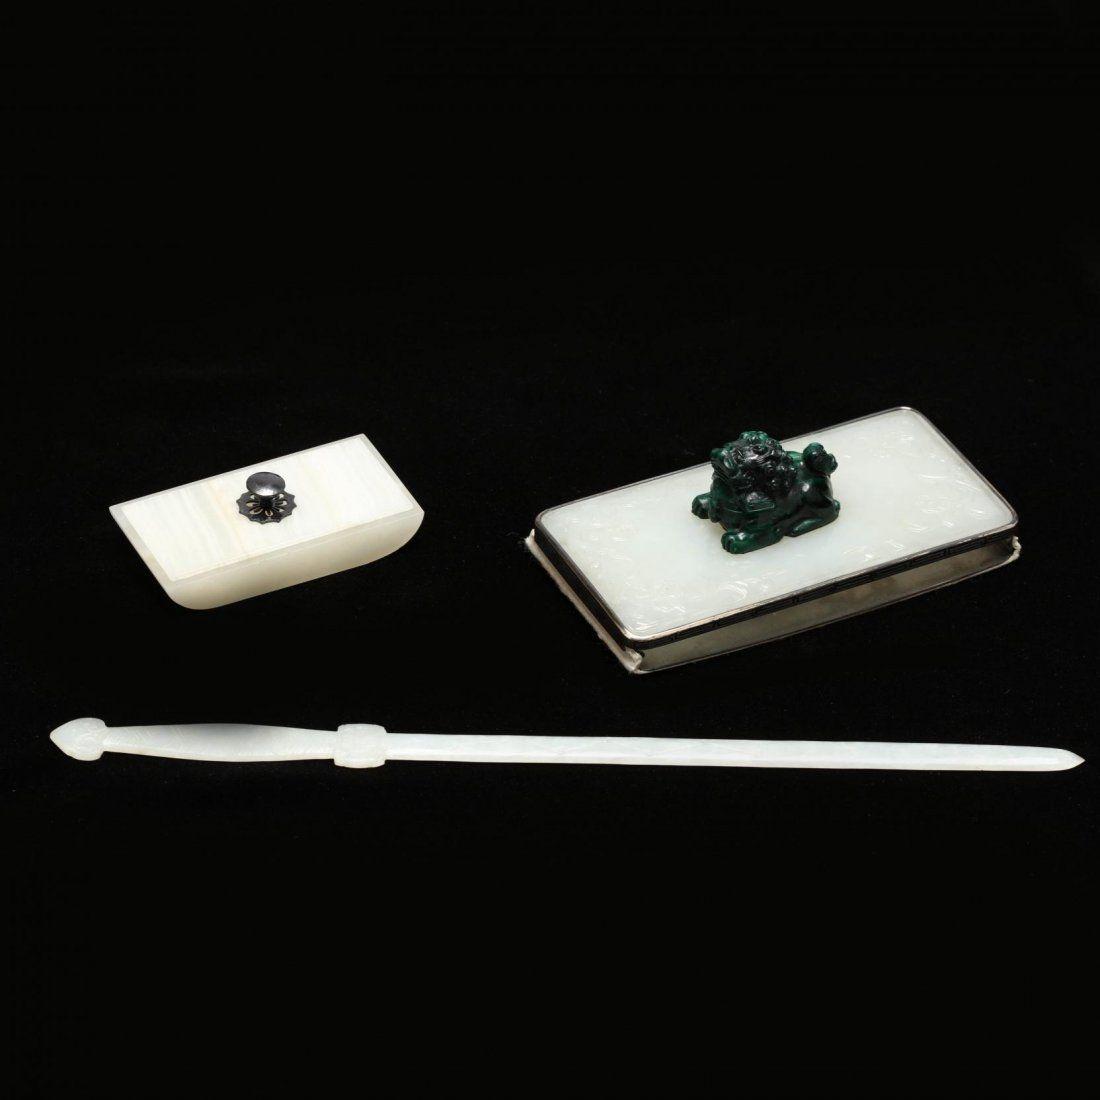 Three Piece Jade and Hard Stone Desk Set